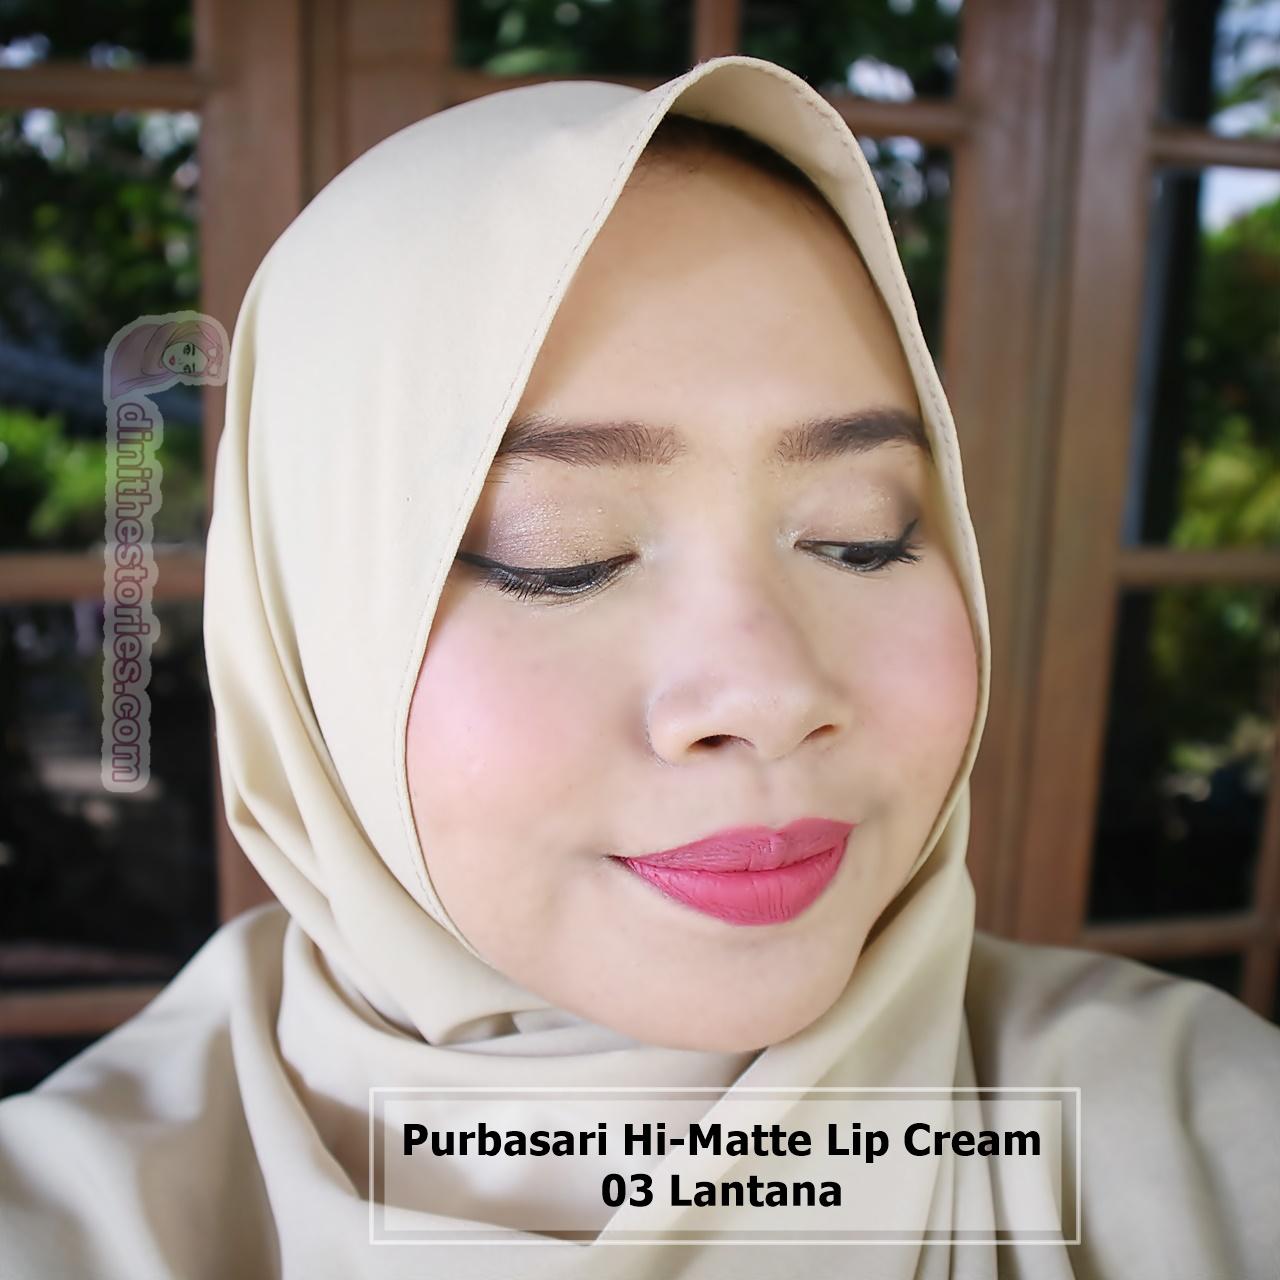 Purbasari Hi Matte Lip Cream Review And Swatch All Shades Dini The Lipstick 03 Lantana